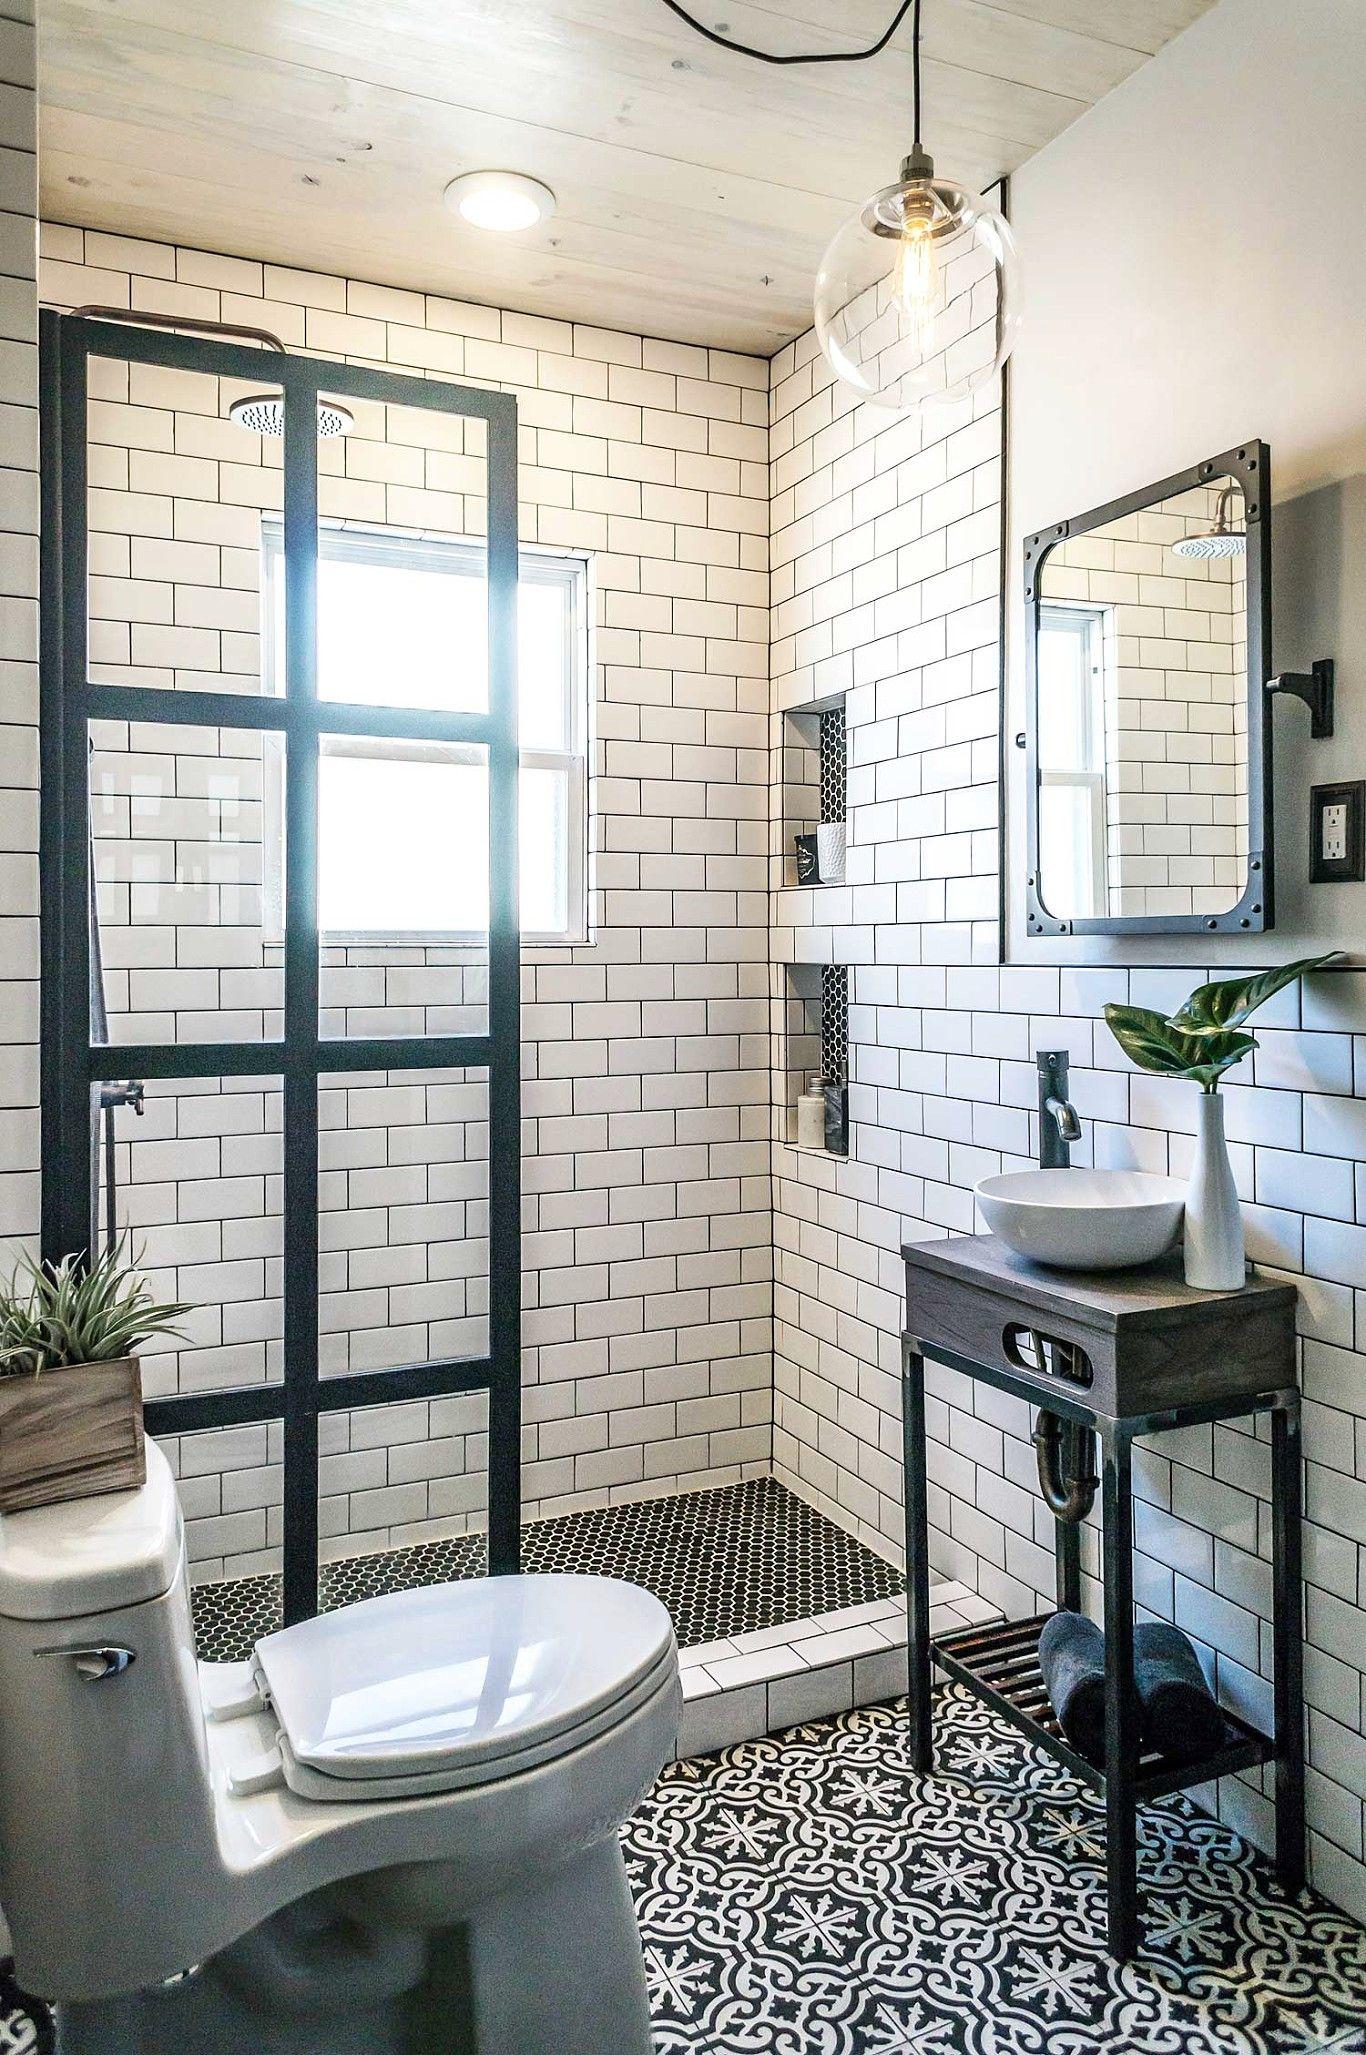 Image Result For 5x7 Bathroom Small Bathroom Remodel Tiny House Bathroom Small Bathroom Decor